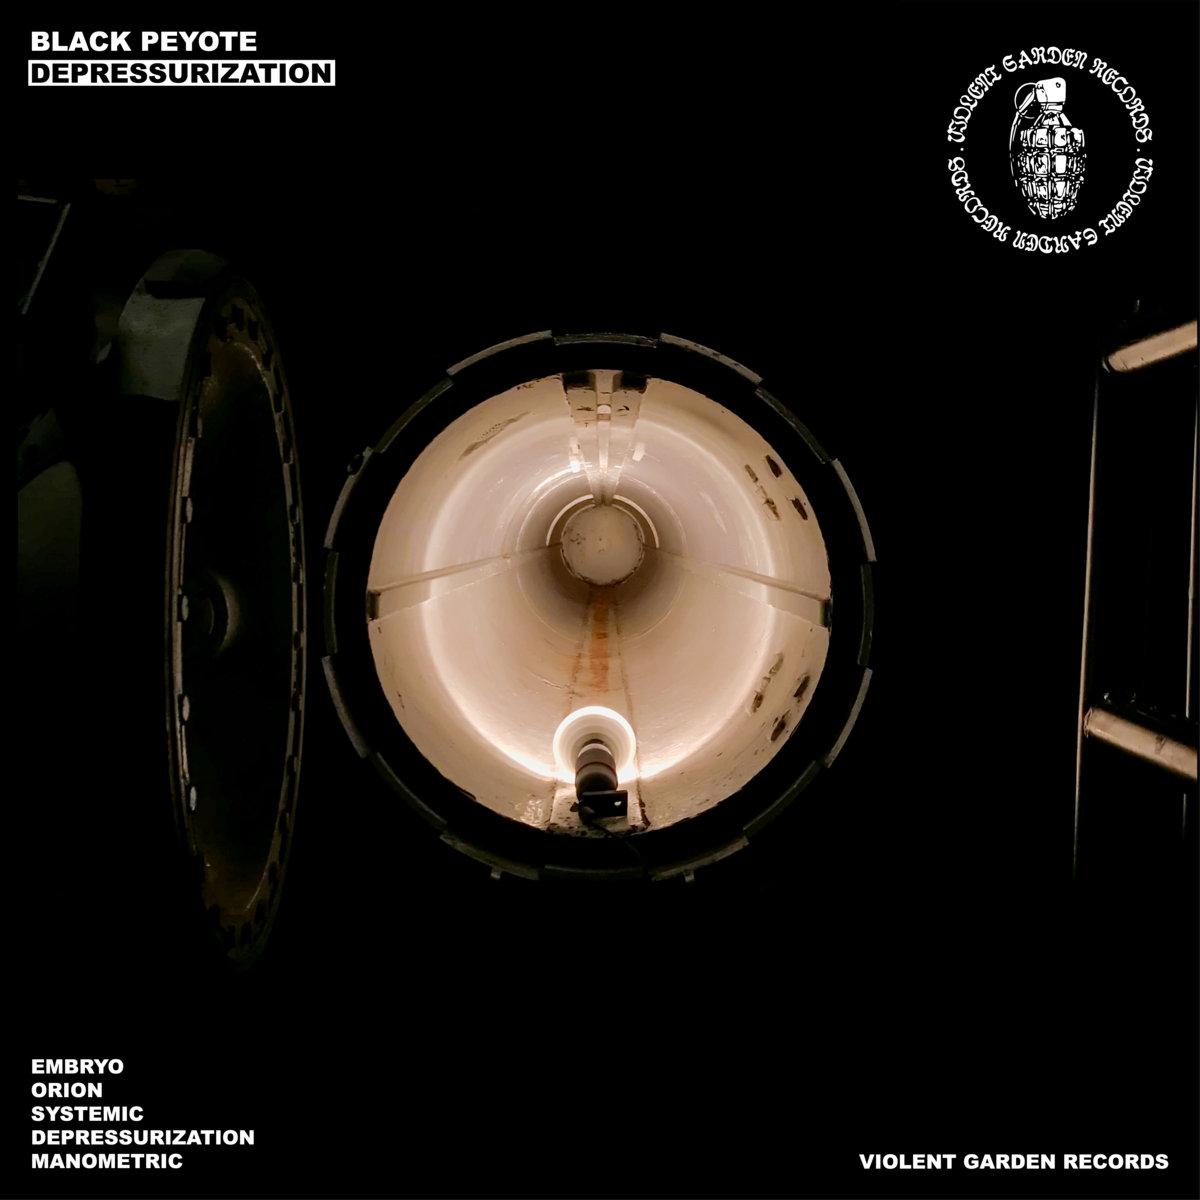 Black Peyote